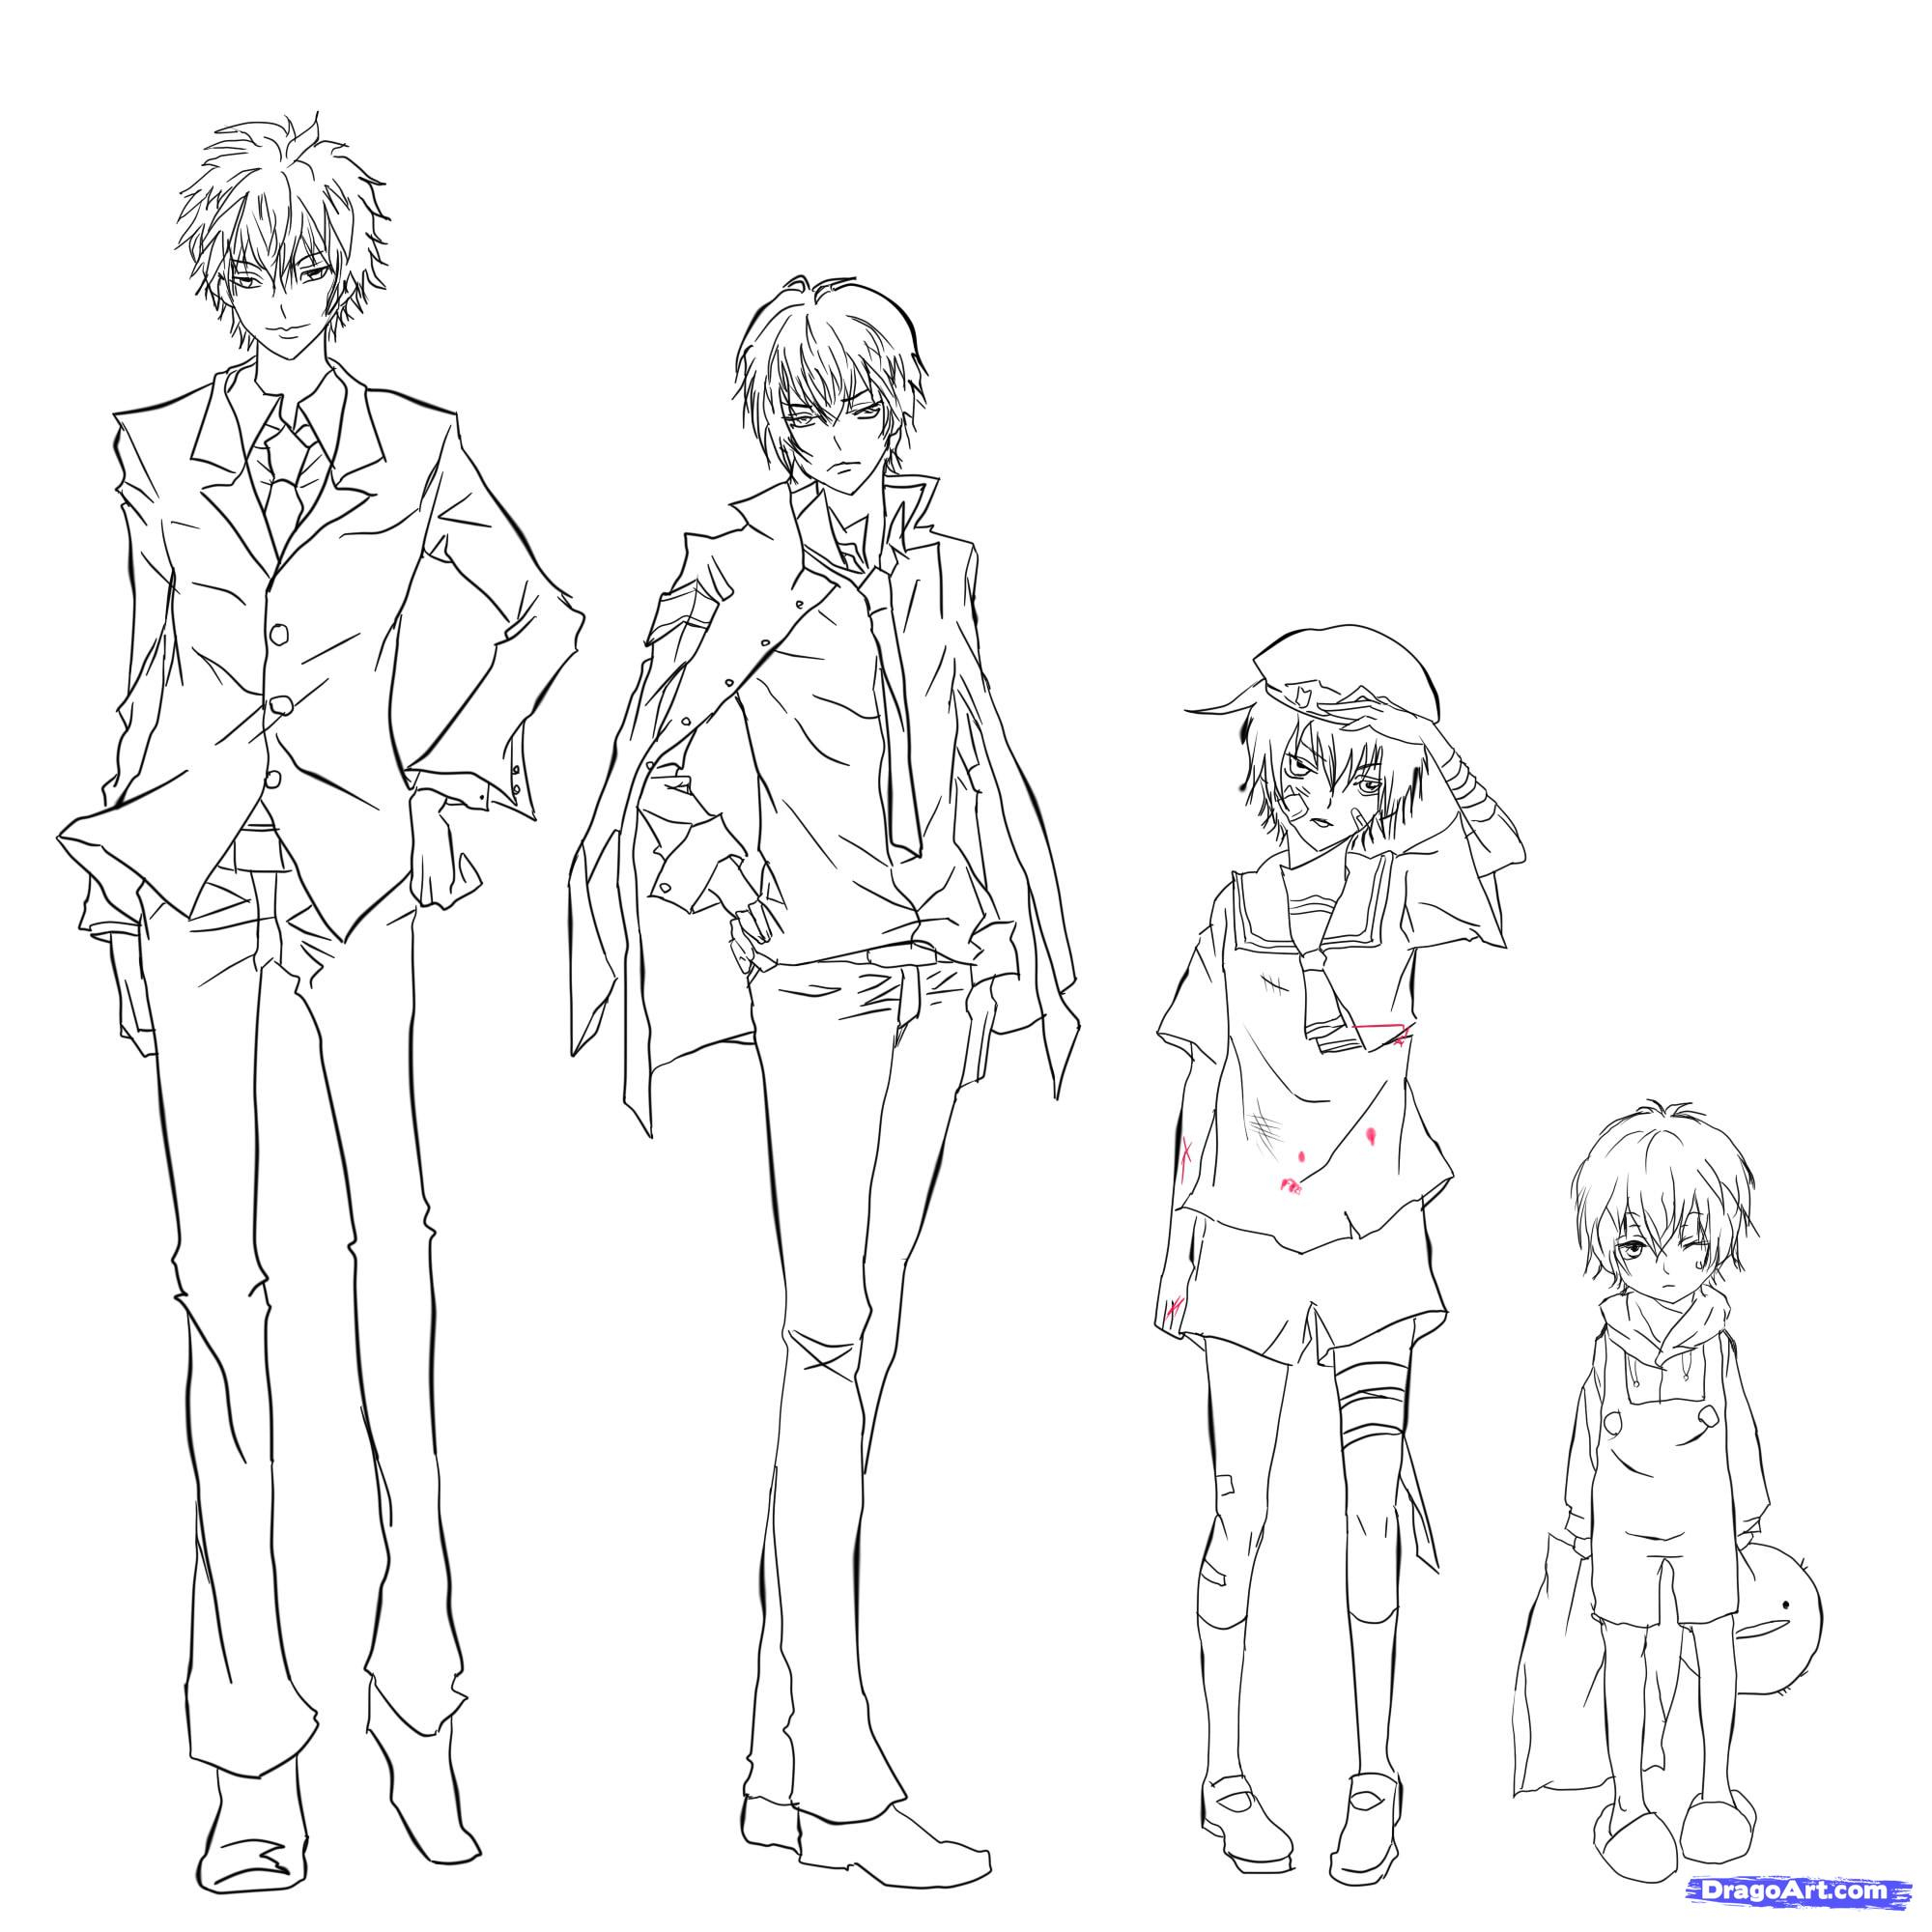 2000x2000 How To Draw Manga Boys 16. How To Sketch An Anime Boy